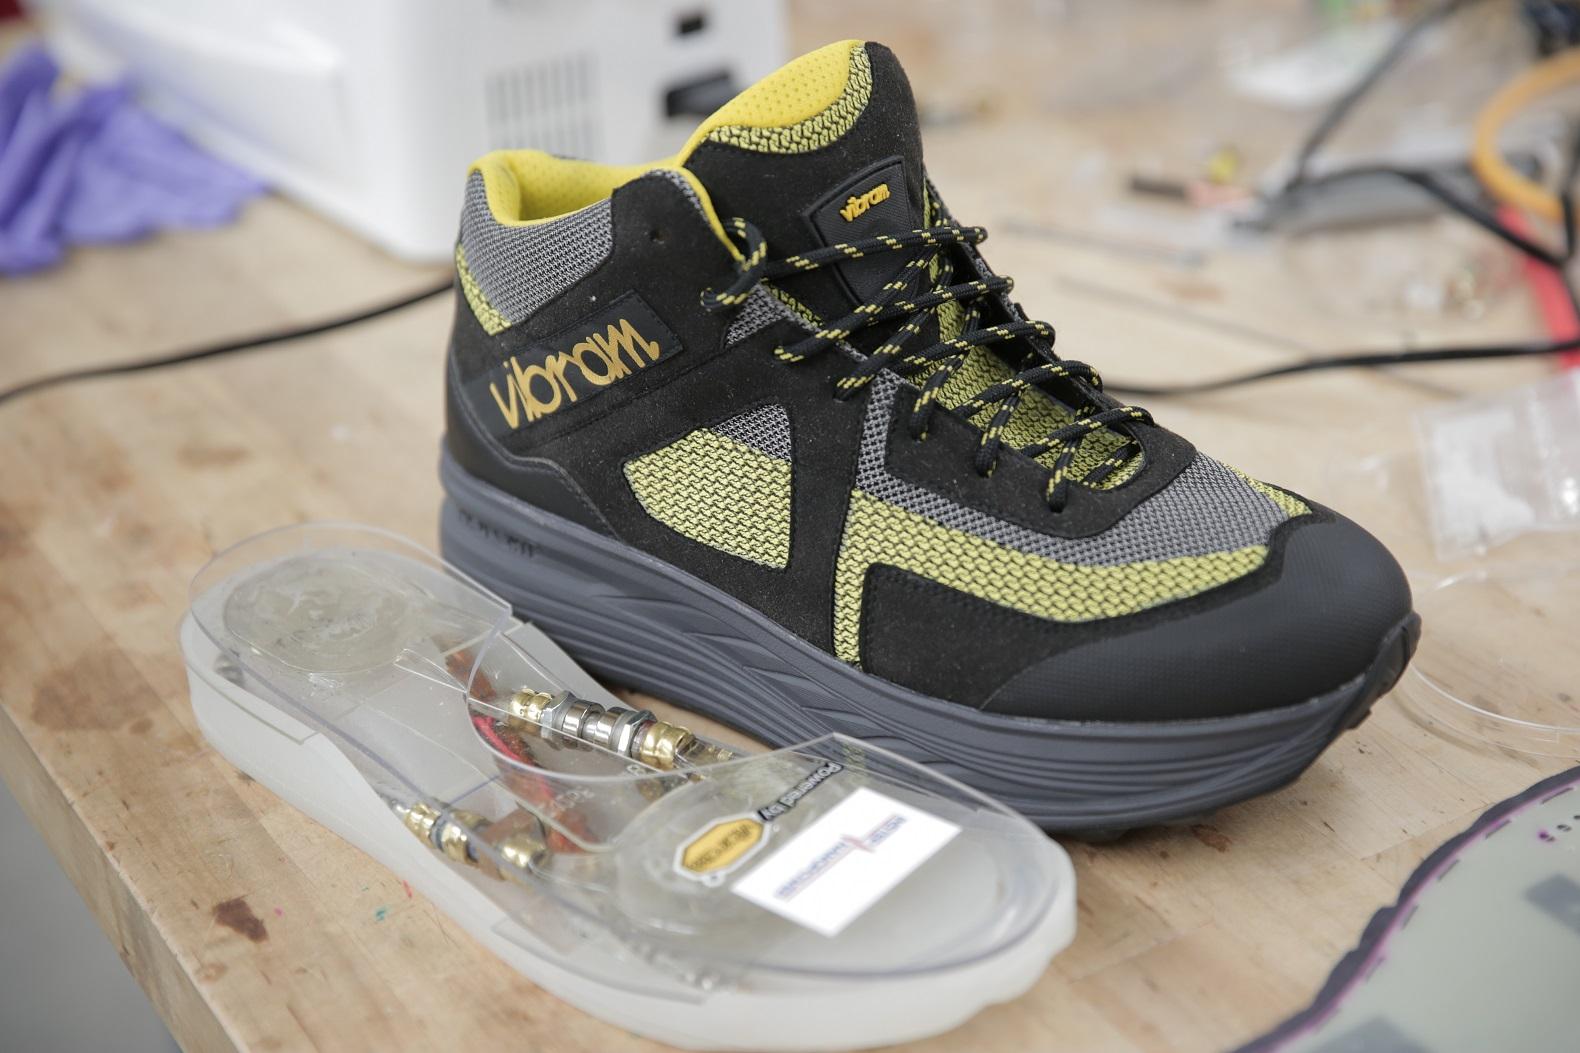 Energia-InStep+NanoPower+shoes